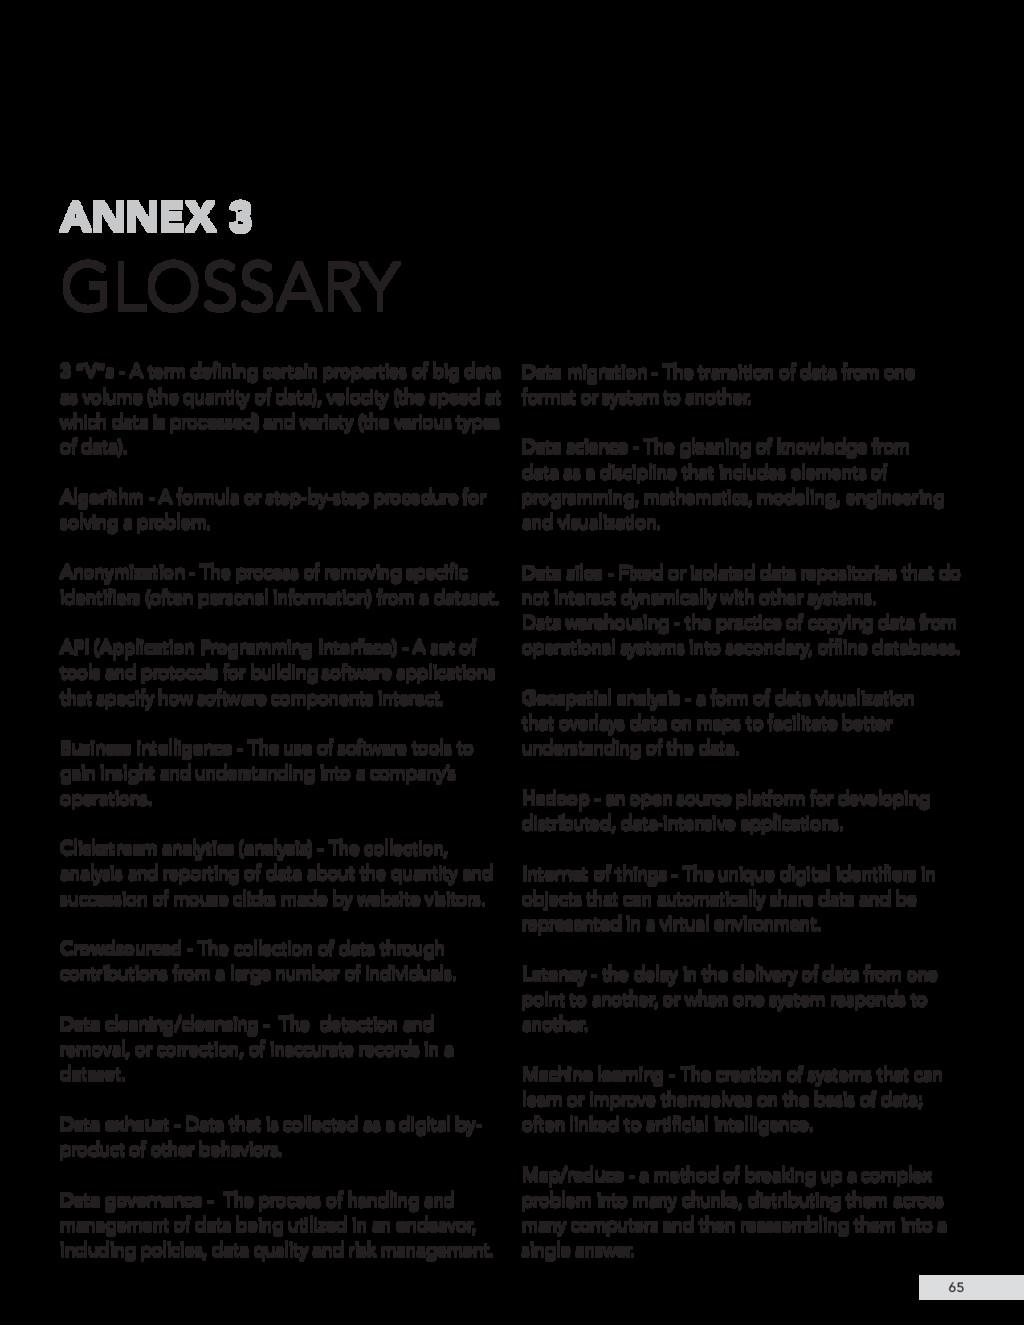 "GLOSSARY ANNEX 3 65 3 ""V""s - A term defining ce..."